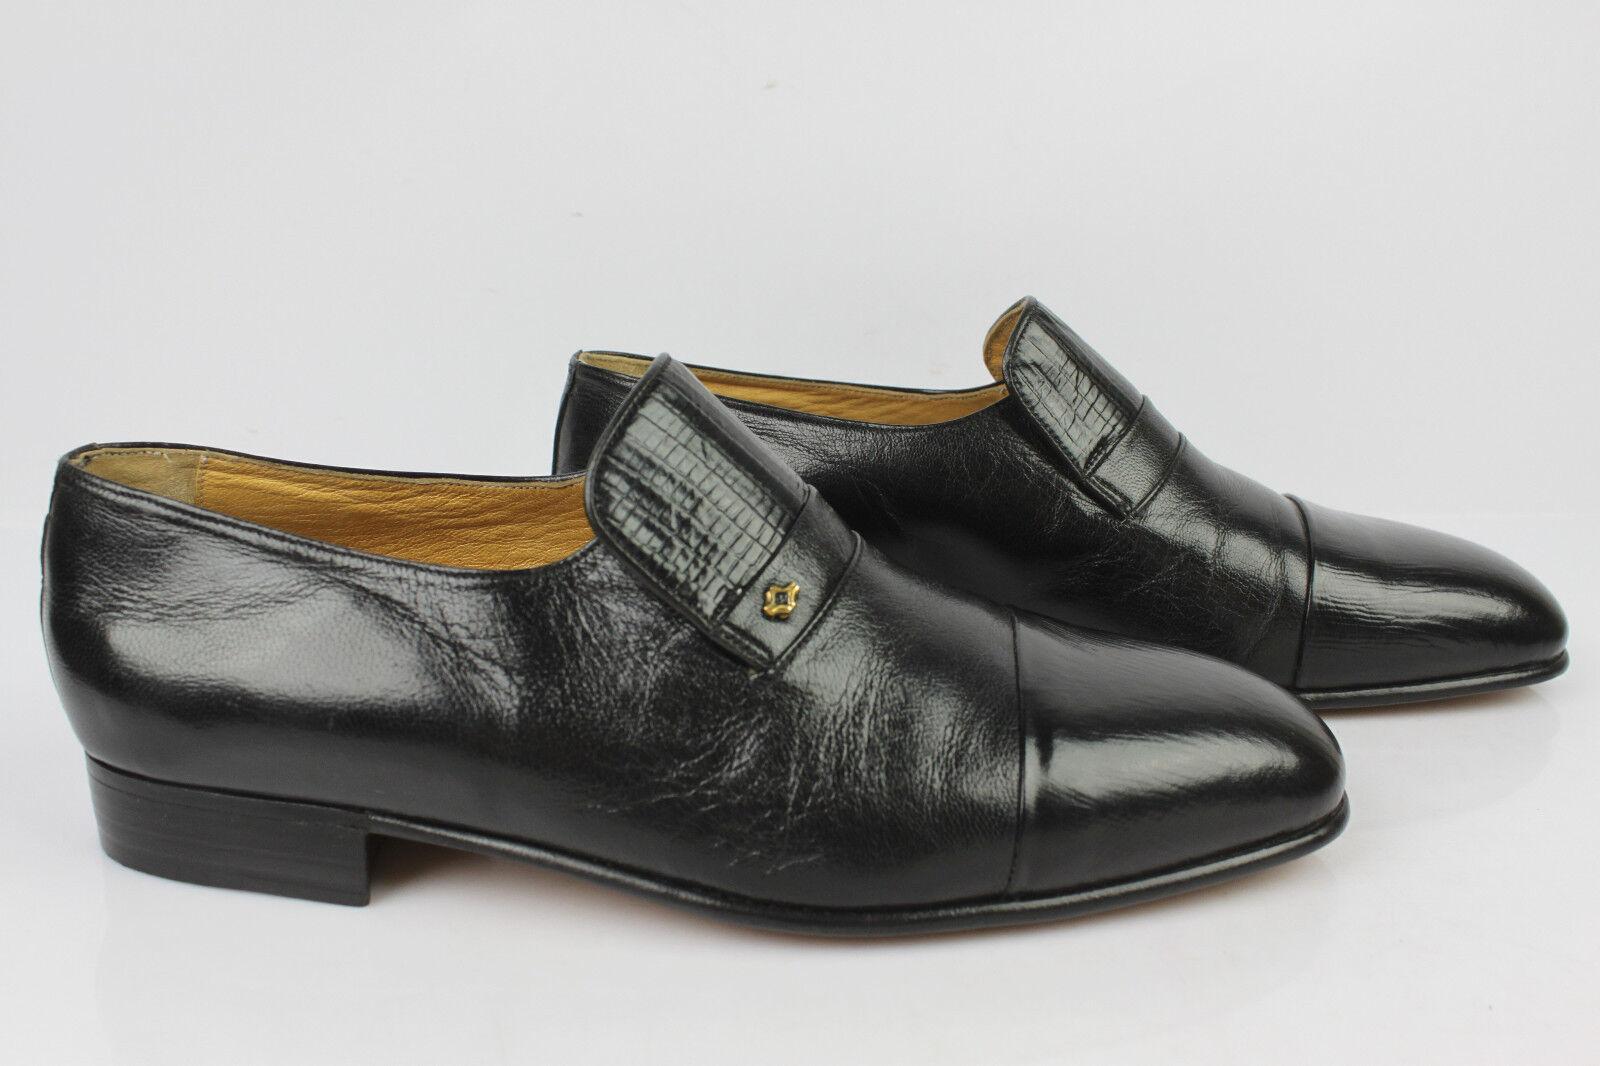 vintage Mokassiner Herstellung LANZONI Schuhe Italien Hand Herstellung Mokassiner Vollleder Schwarz de 38f17b